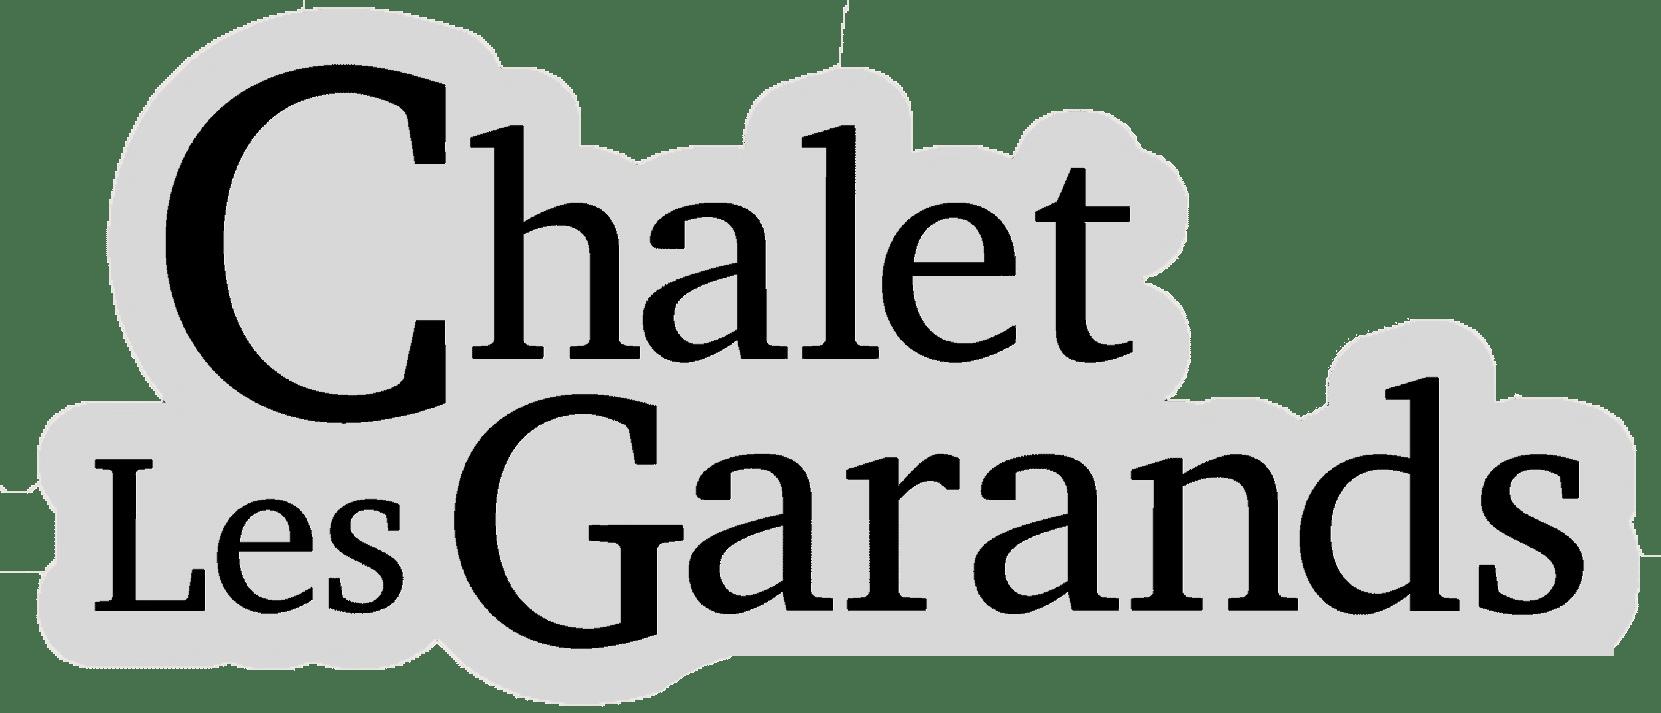 Chalet les Garands à Valmeinier